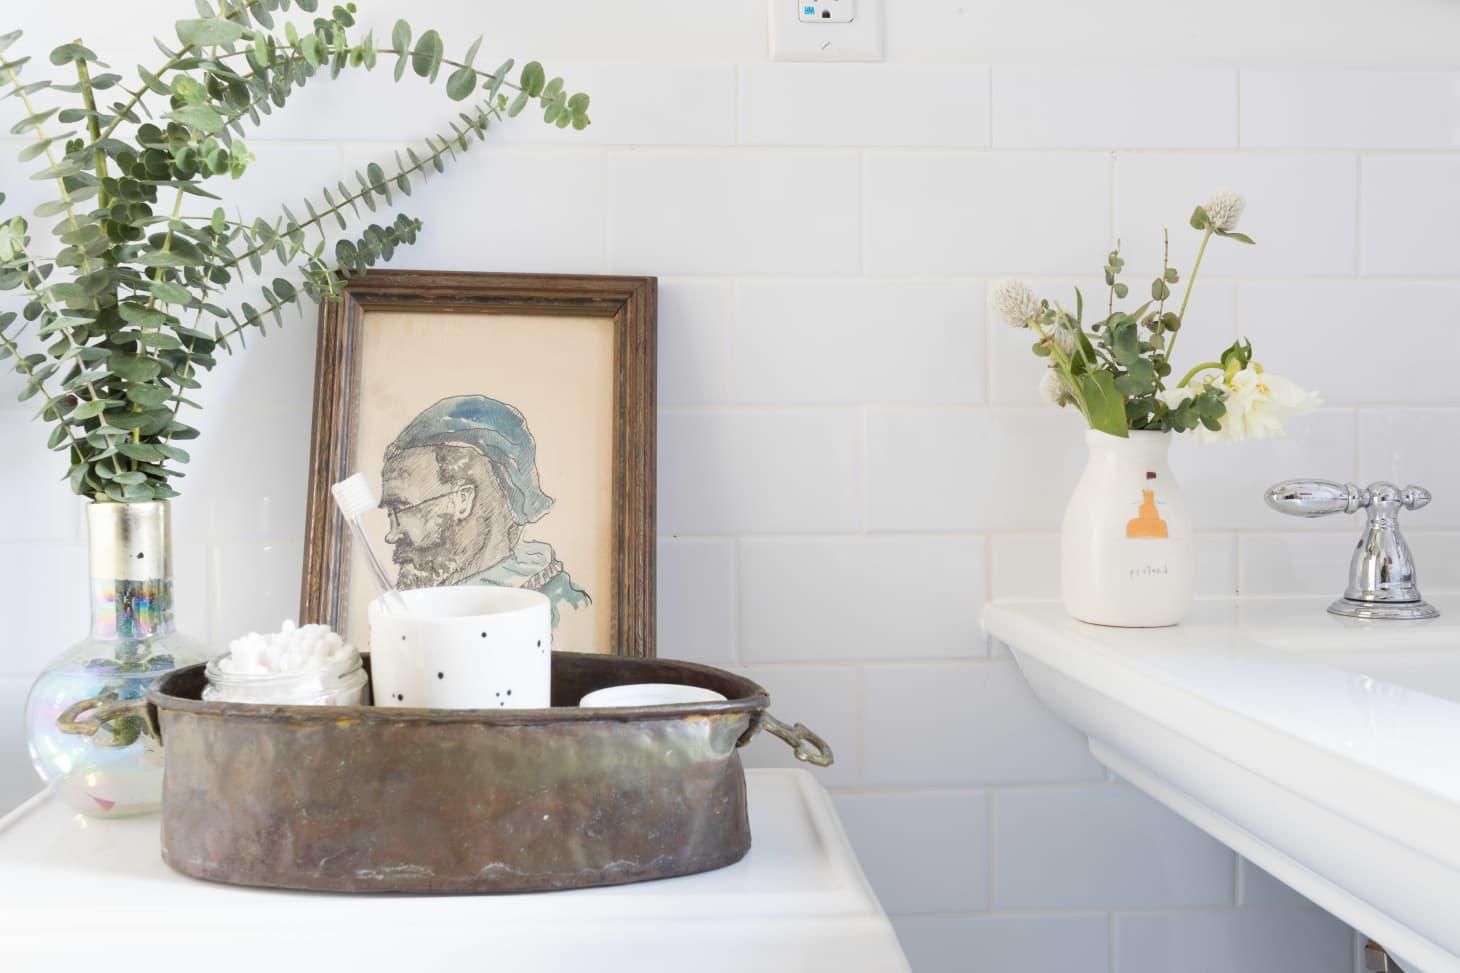 25 Small Bathroom Storage & Design Ideas - Storage ... on Small Apartment Bathroom Storage Ideas  id=51320